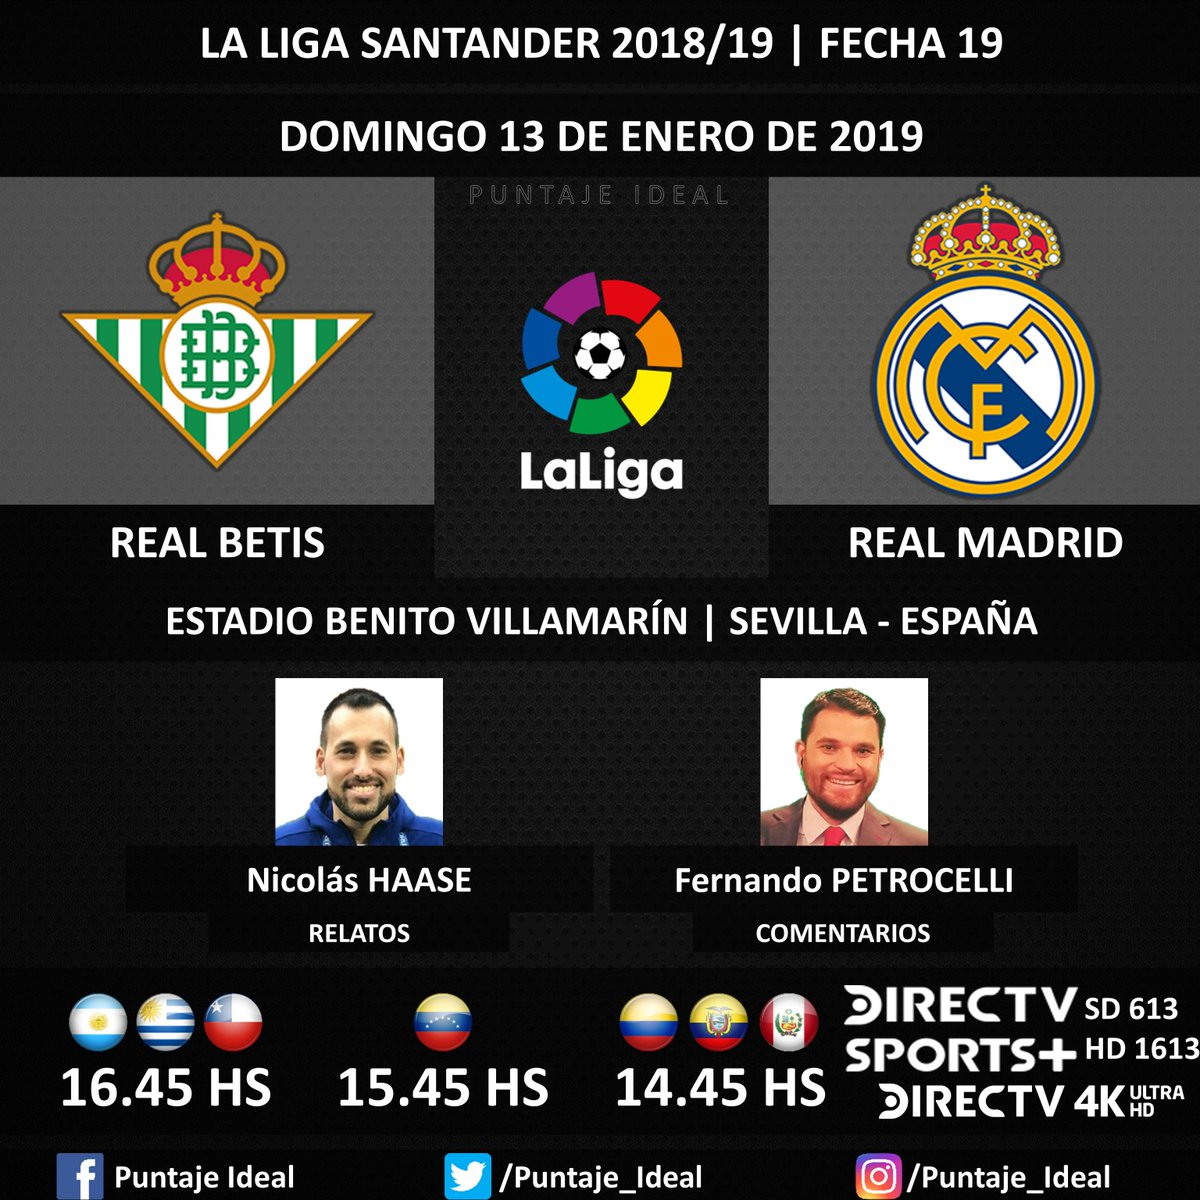 ⚽ #FútbolEnDIRECTV   #RealBetis vs. #RealMadrid 🎙 Relatos: @haasenico  🎙 Comentarios: @fpetrocelli  📺 TV: @DIRECTVSports Sudamérica (610 - 1610 HD) - #Torneos 📺 TV: #DIRECTV 4K Ultra HS (4000)  🤳 #SoySportista - #LaLiga 🇪🇸 - #RealBetisRealMadrid  Dale RT 🔃